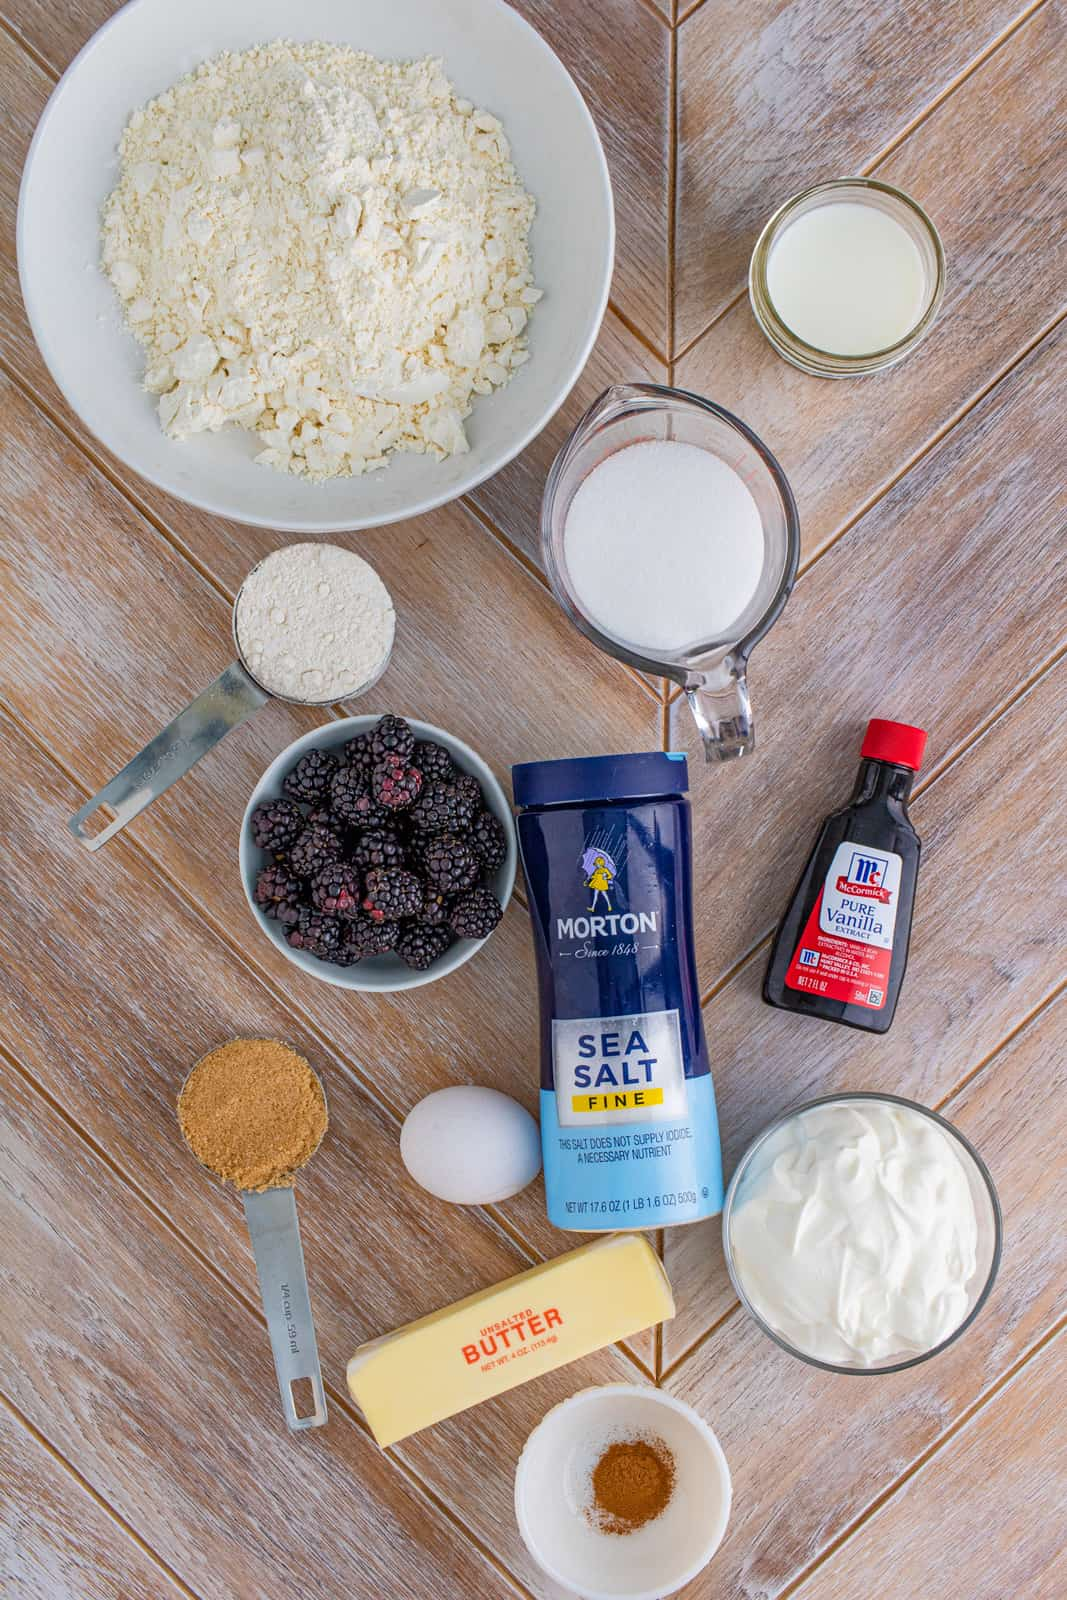 Ingredients needed to make Blackberry Muffins